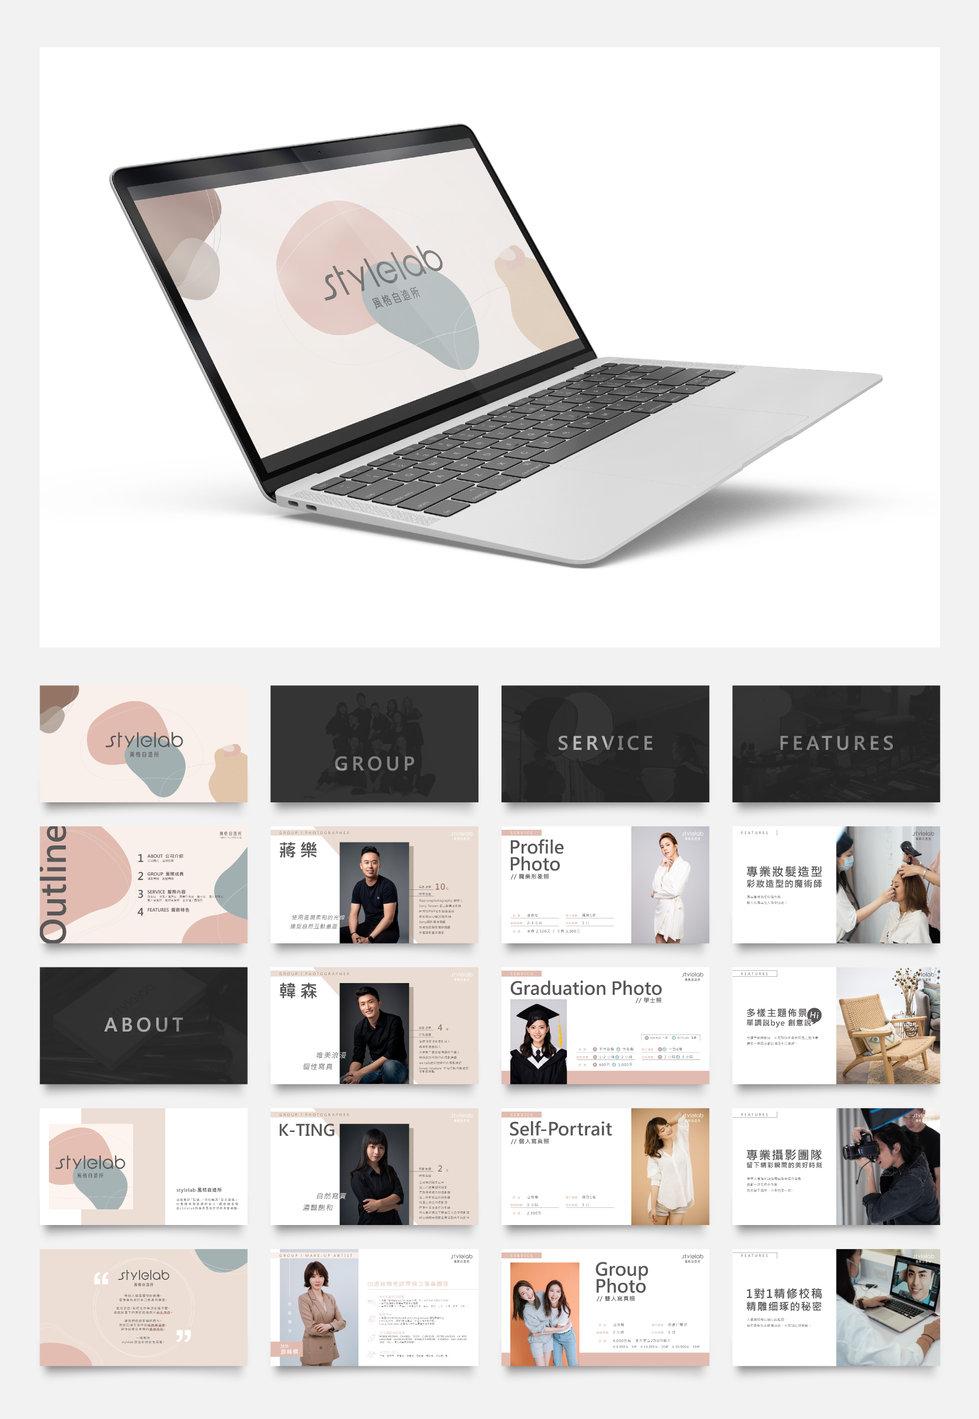 stylelab ppt展示-01.jpg